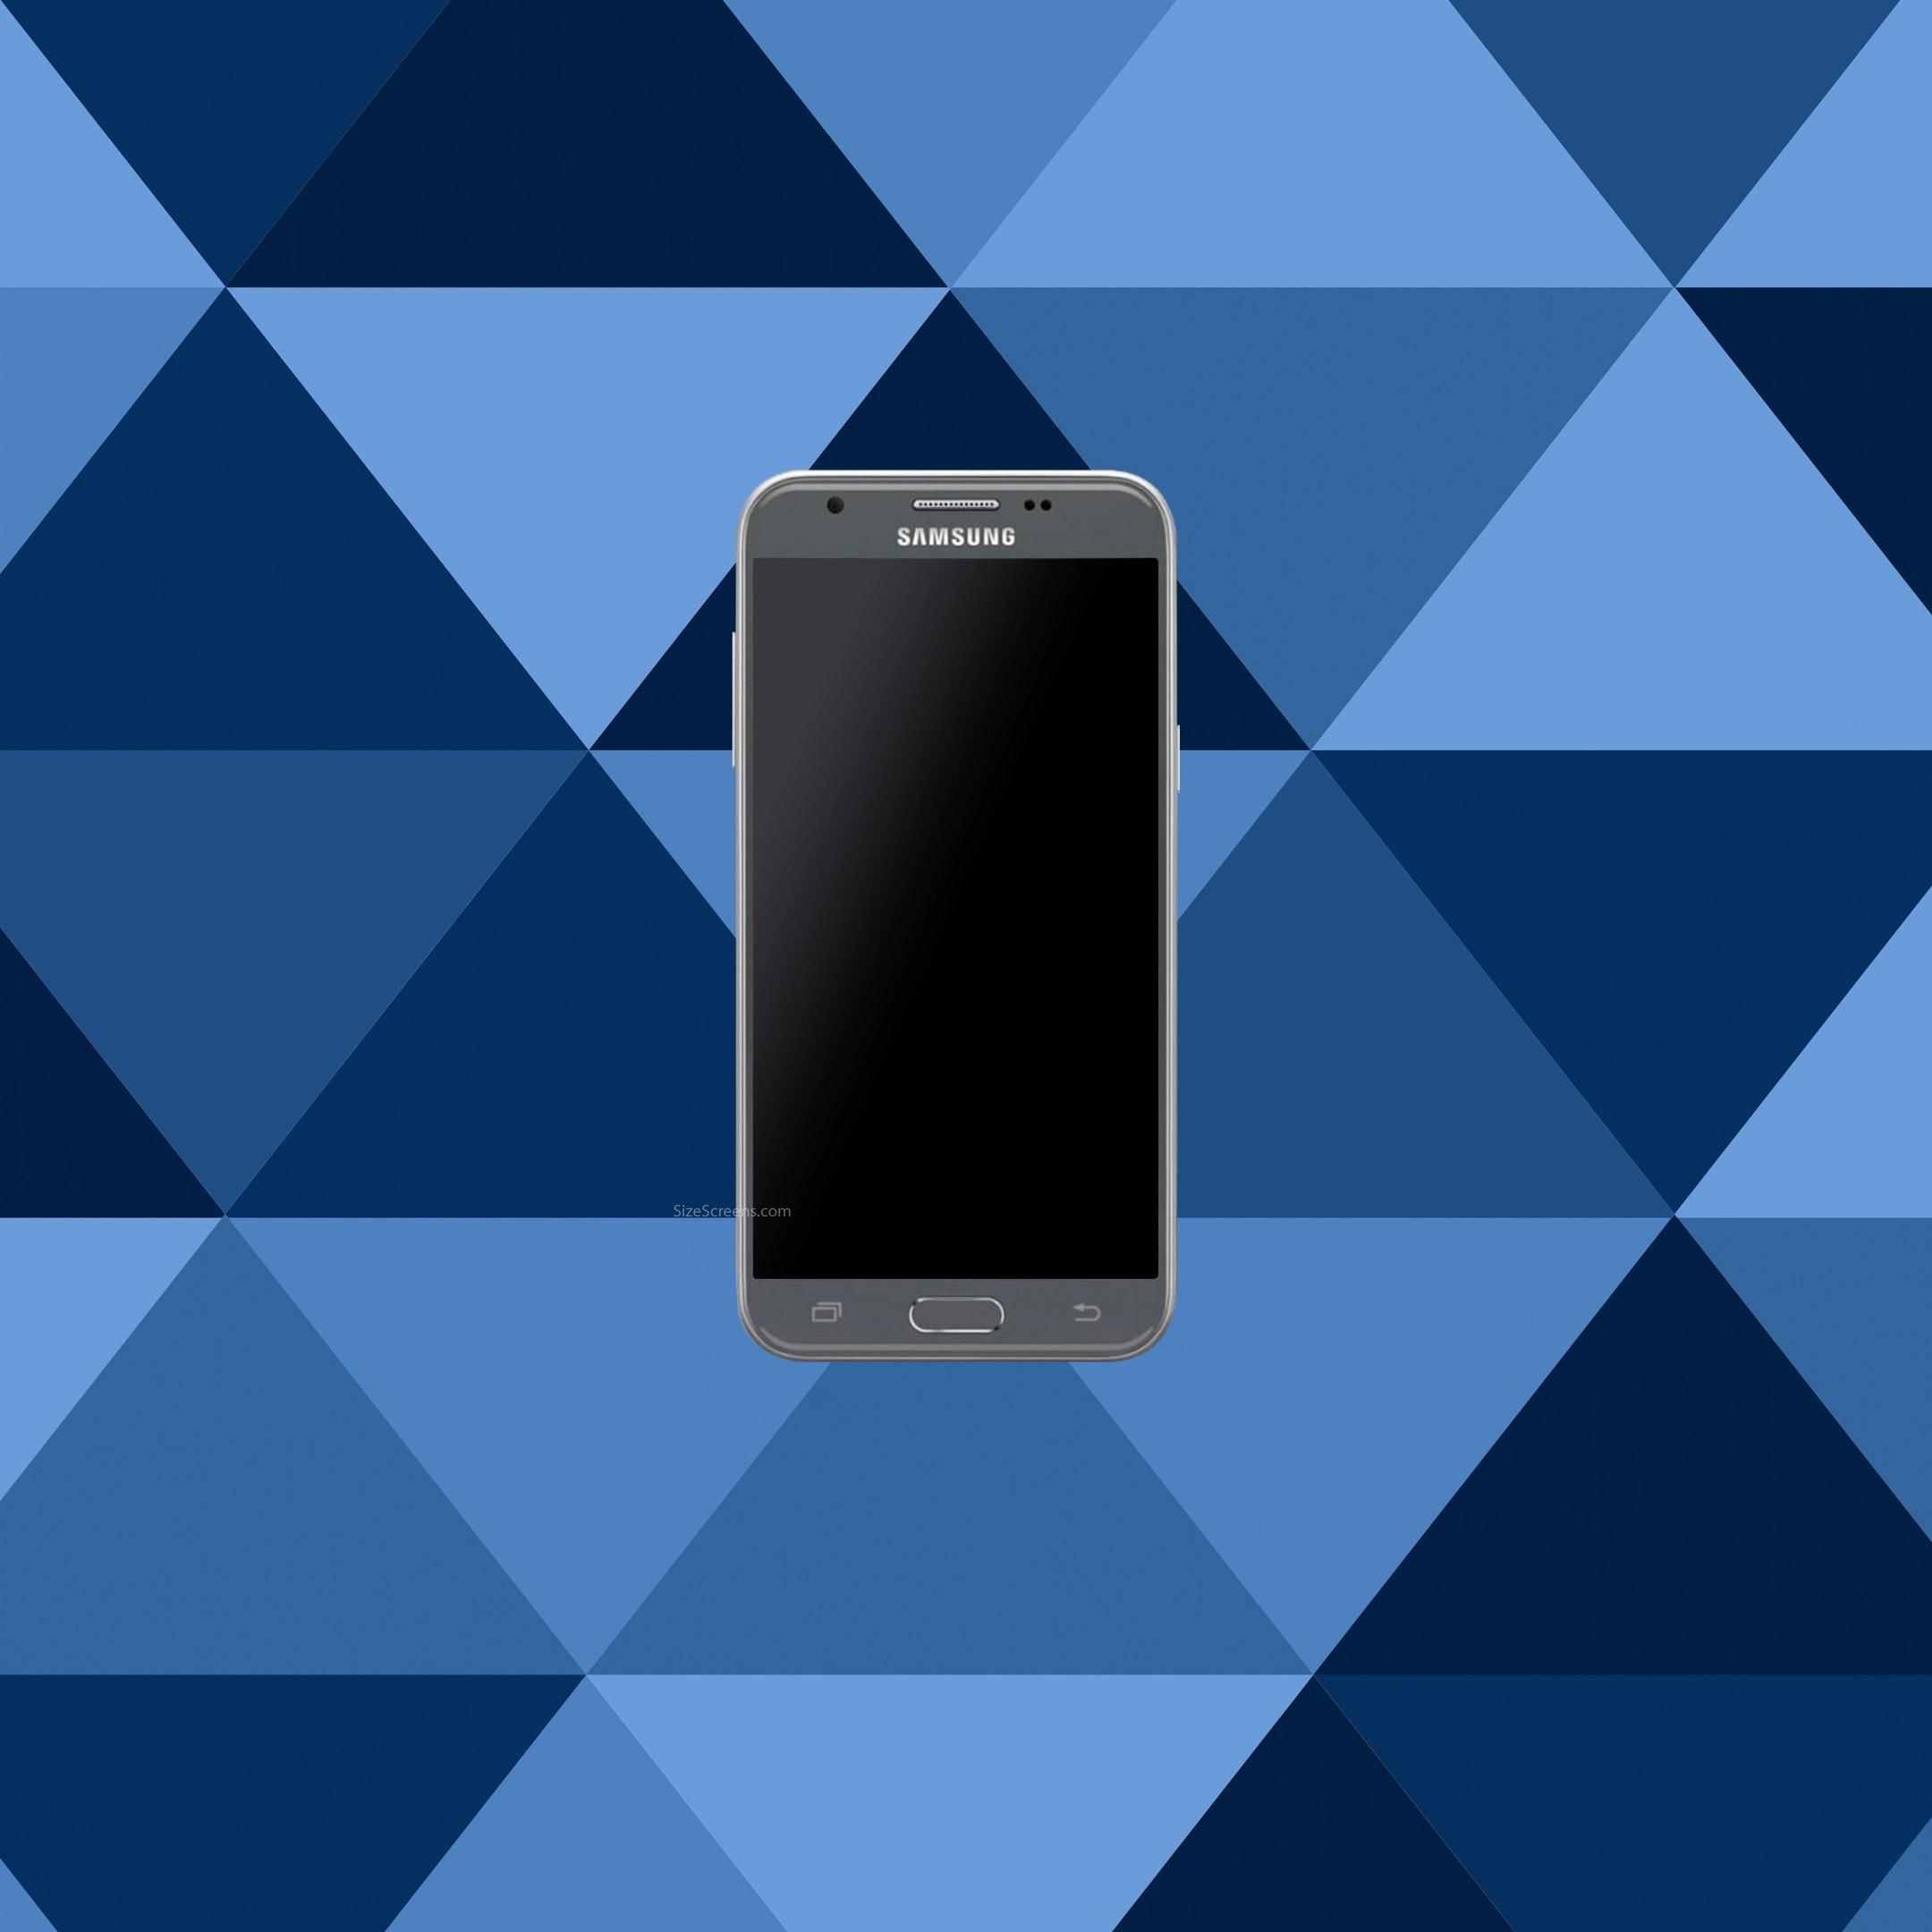 Samsung Galaxy J3 Emerge Screen Specifications Sizescreens Com